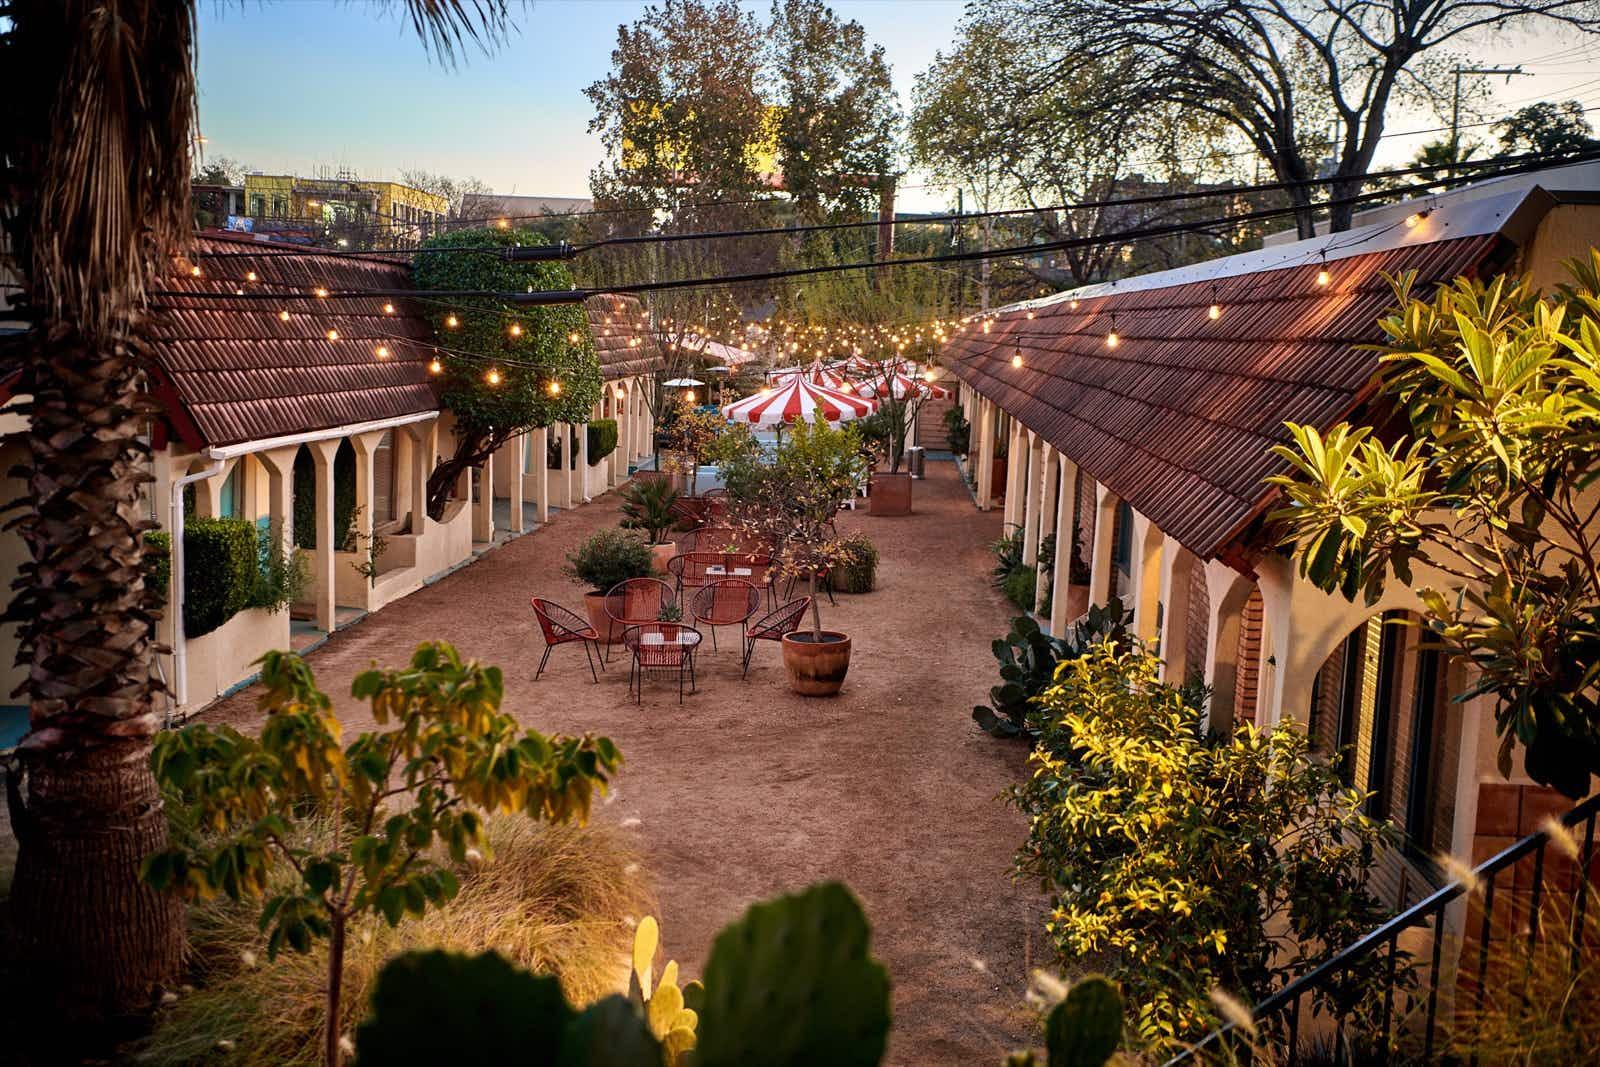 The courtyard bar at Austin Motel © Image courtesy of Austin Motel / Nick Simonite